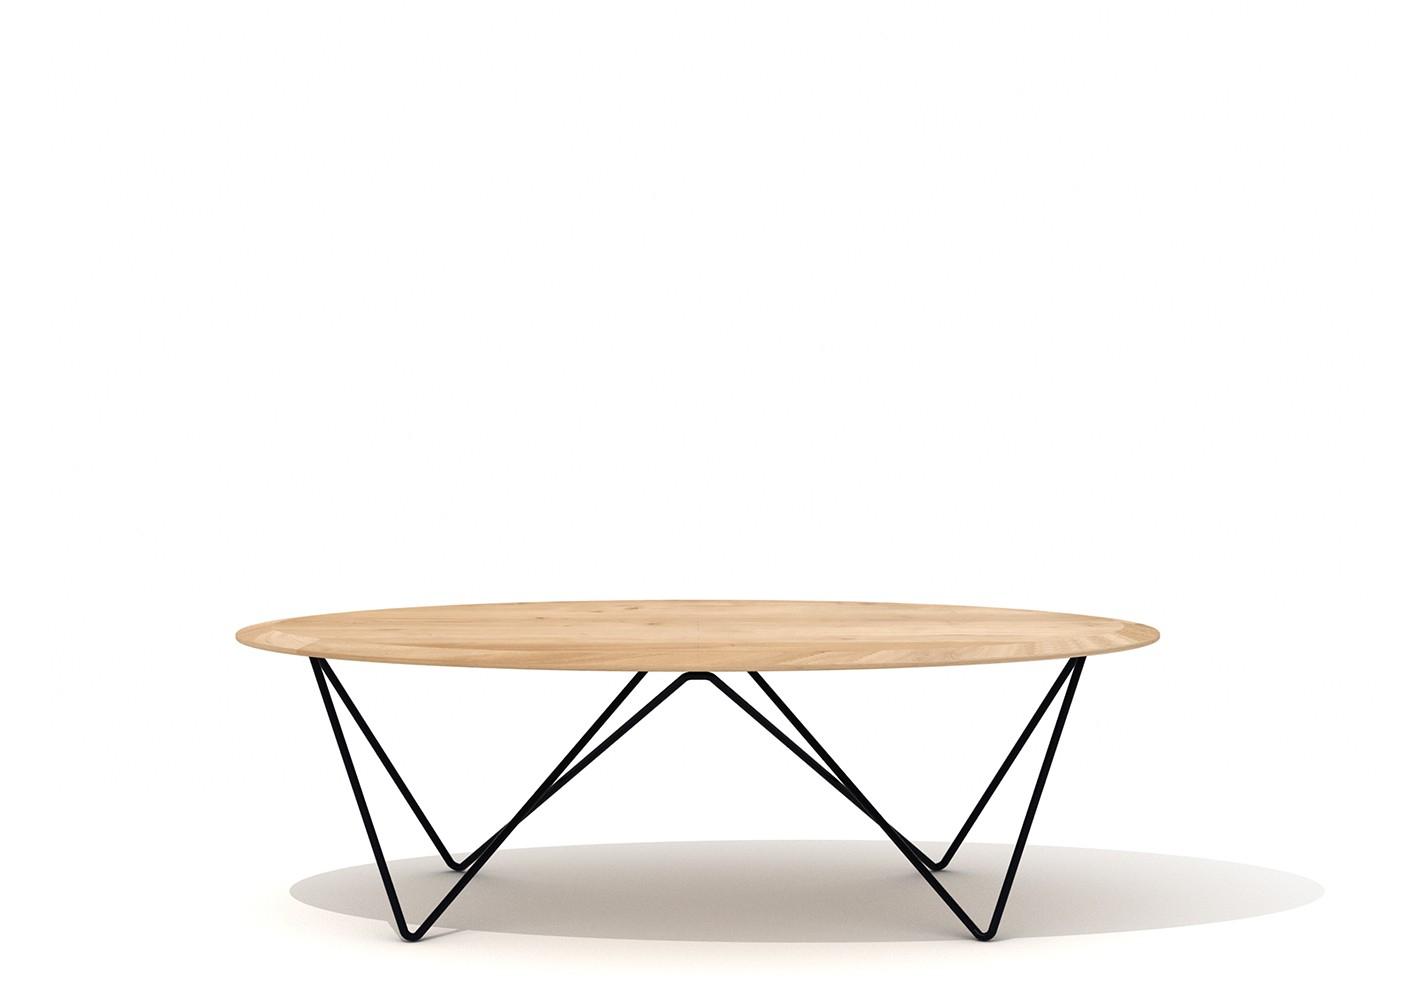 table basse orb design - ethnicraft